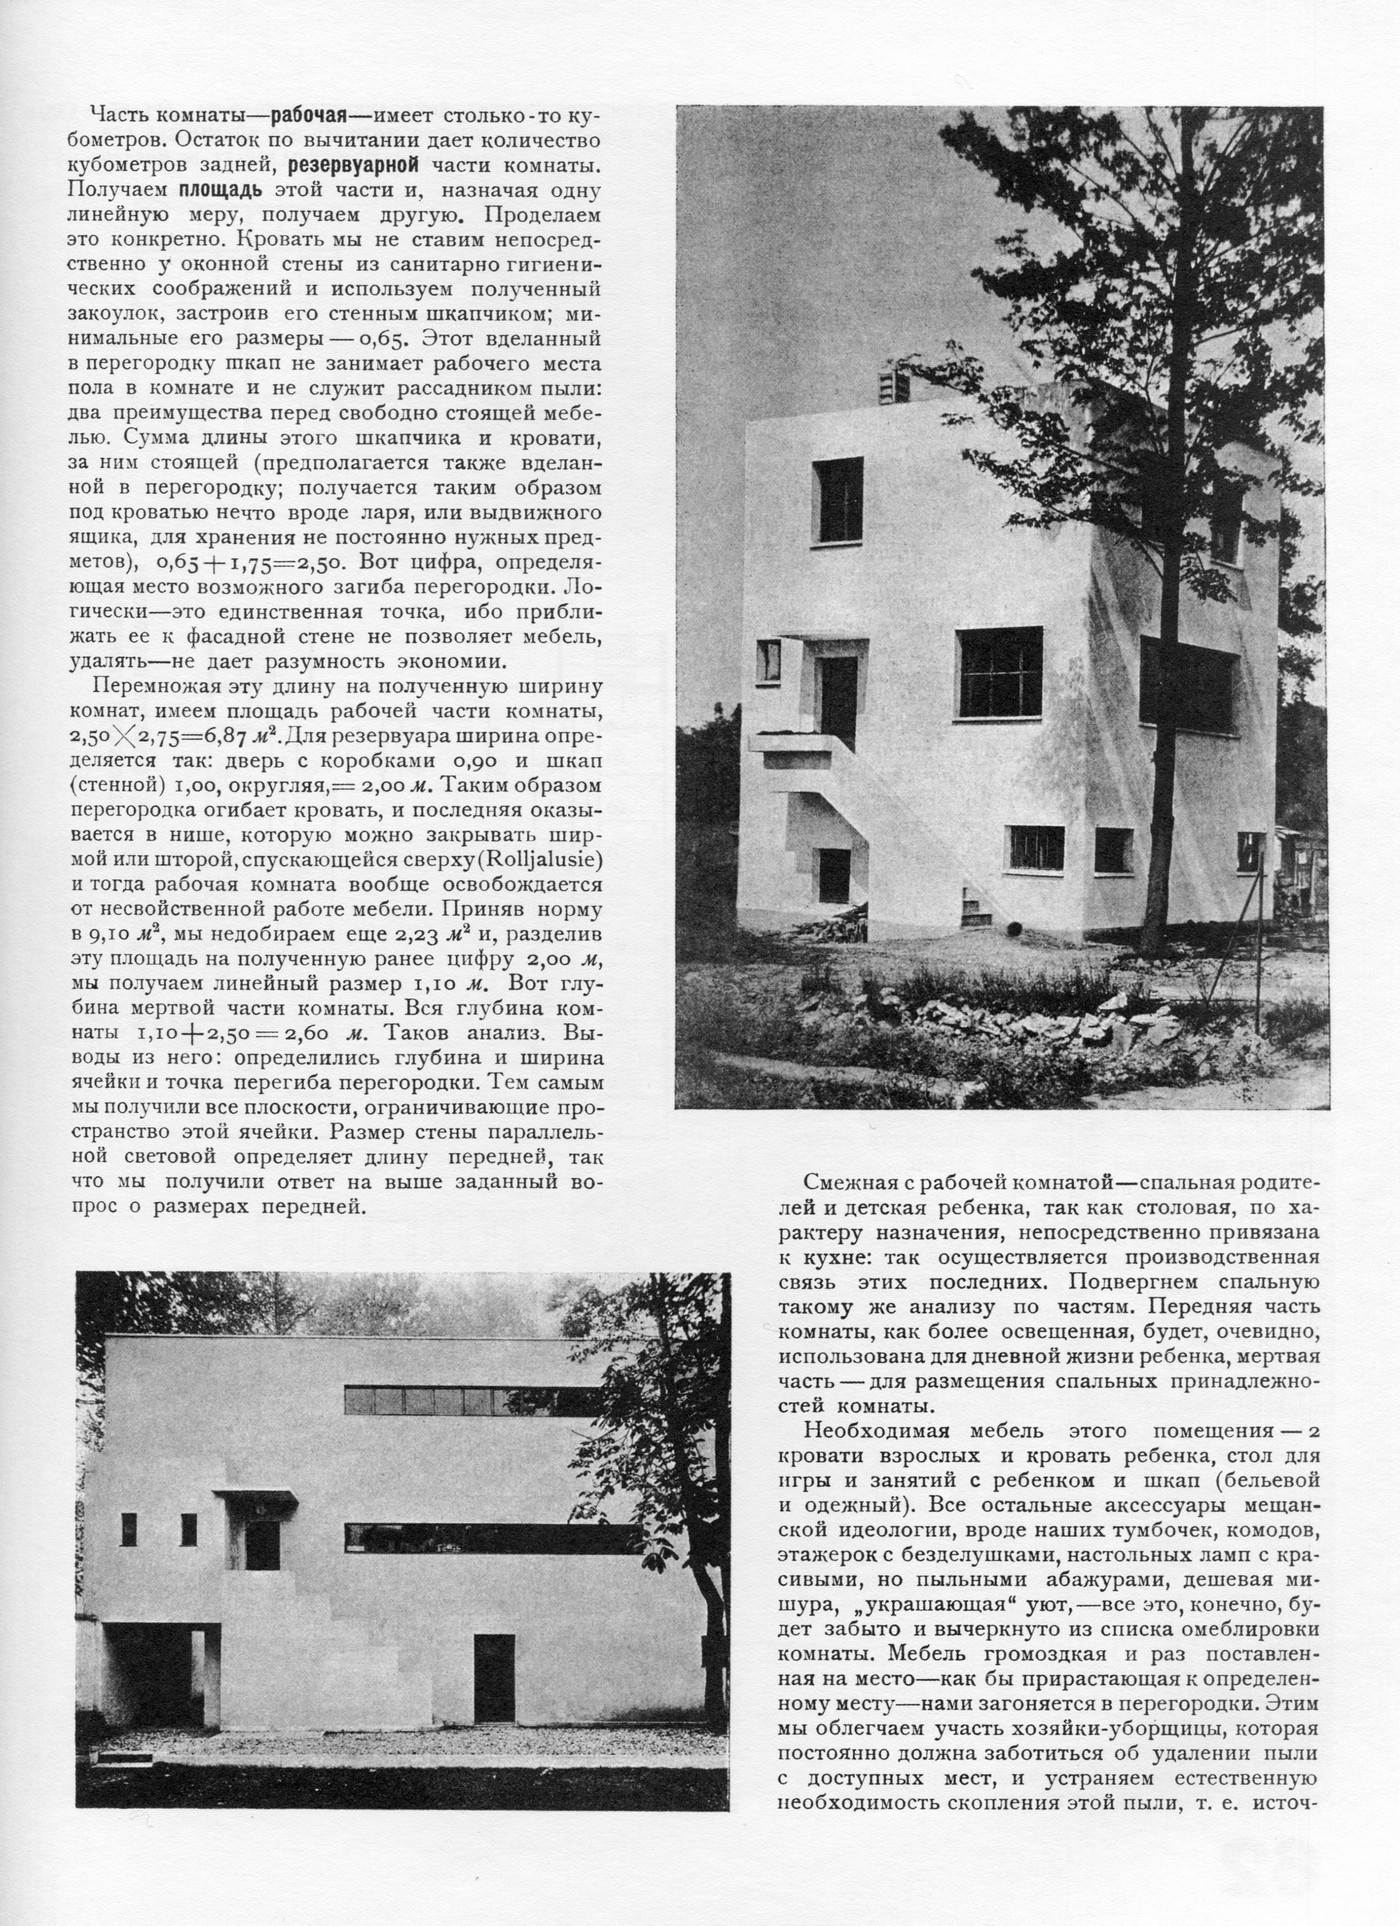 tehne.com-sa-1927-2-1400-017